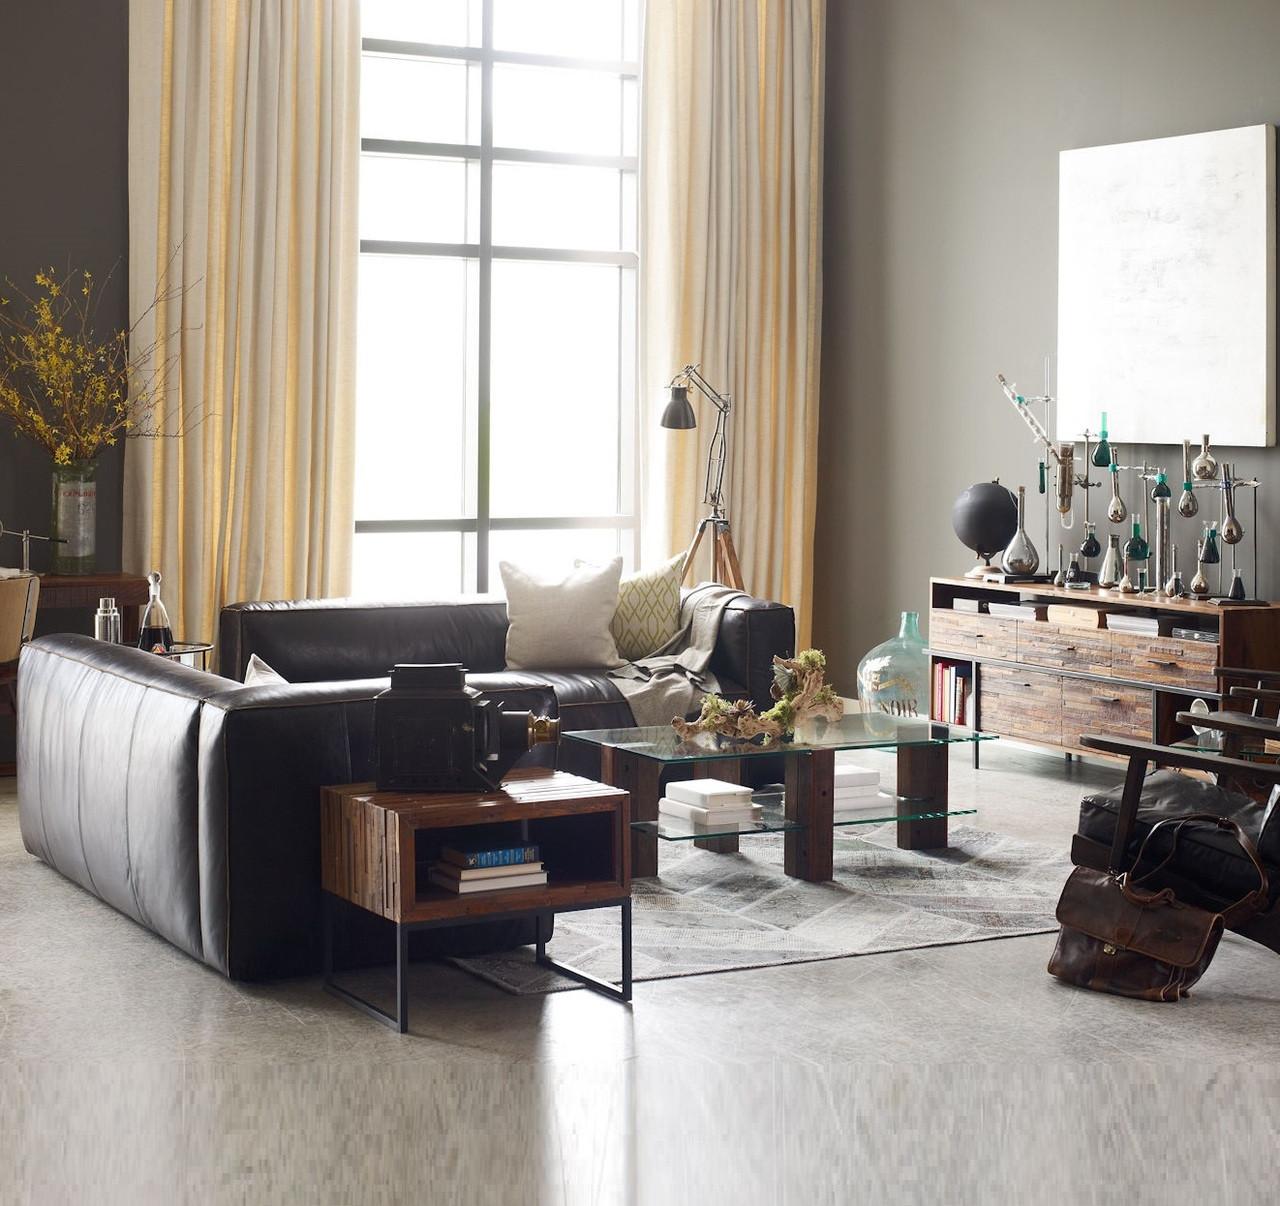 Nolita Saddle Black Leather Modular Sectional Sofa Zin Home